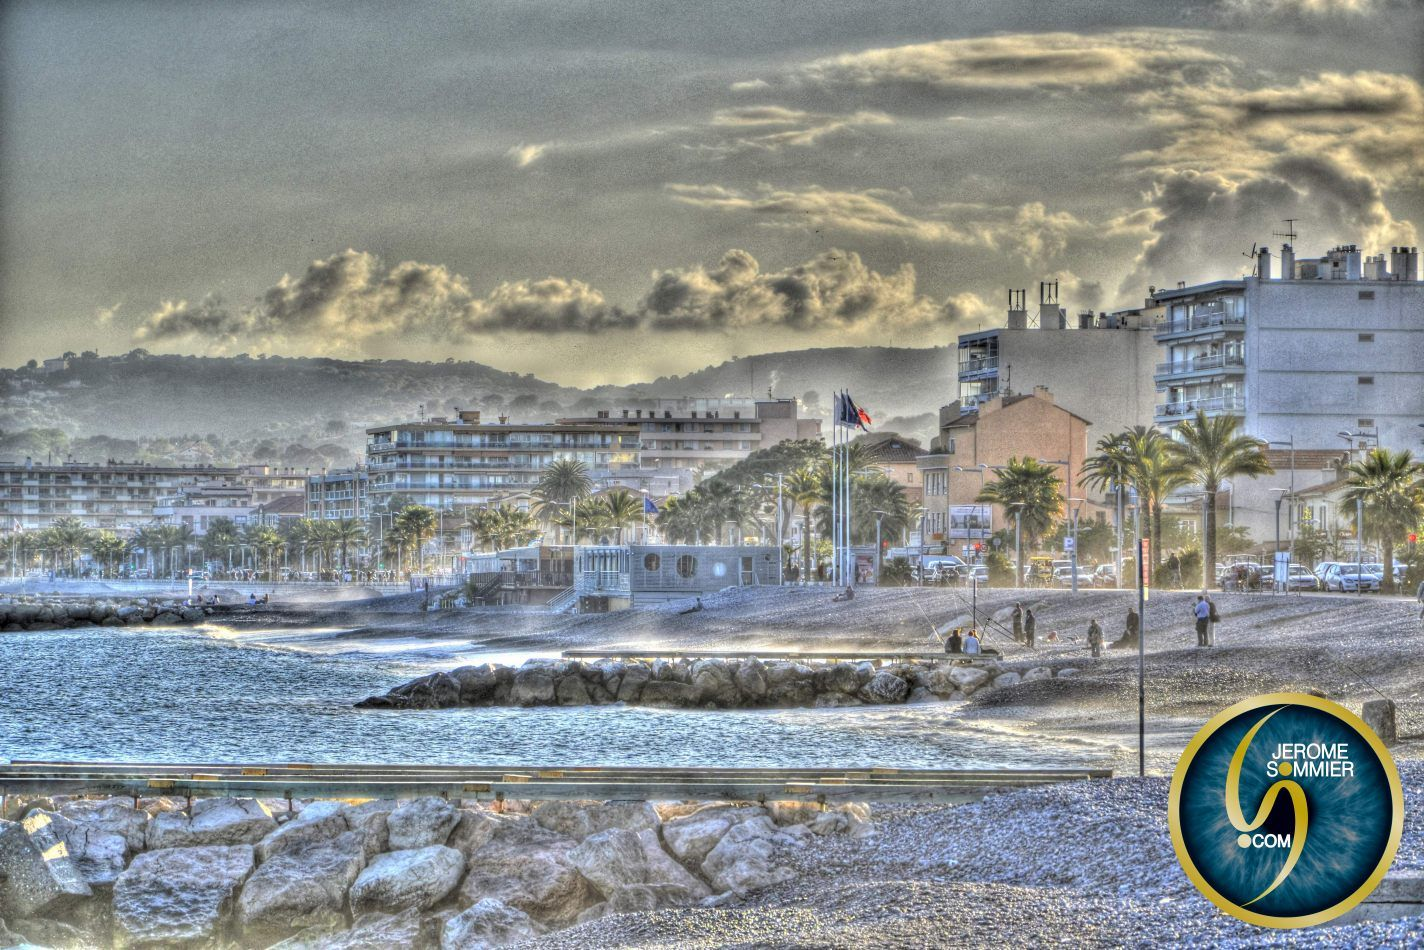 Jerome Sommier Photos - Photo & Graphism: Cagnes sur Mer